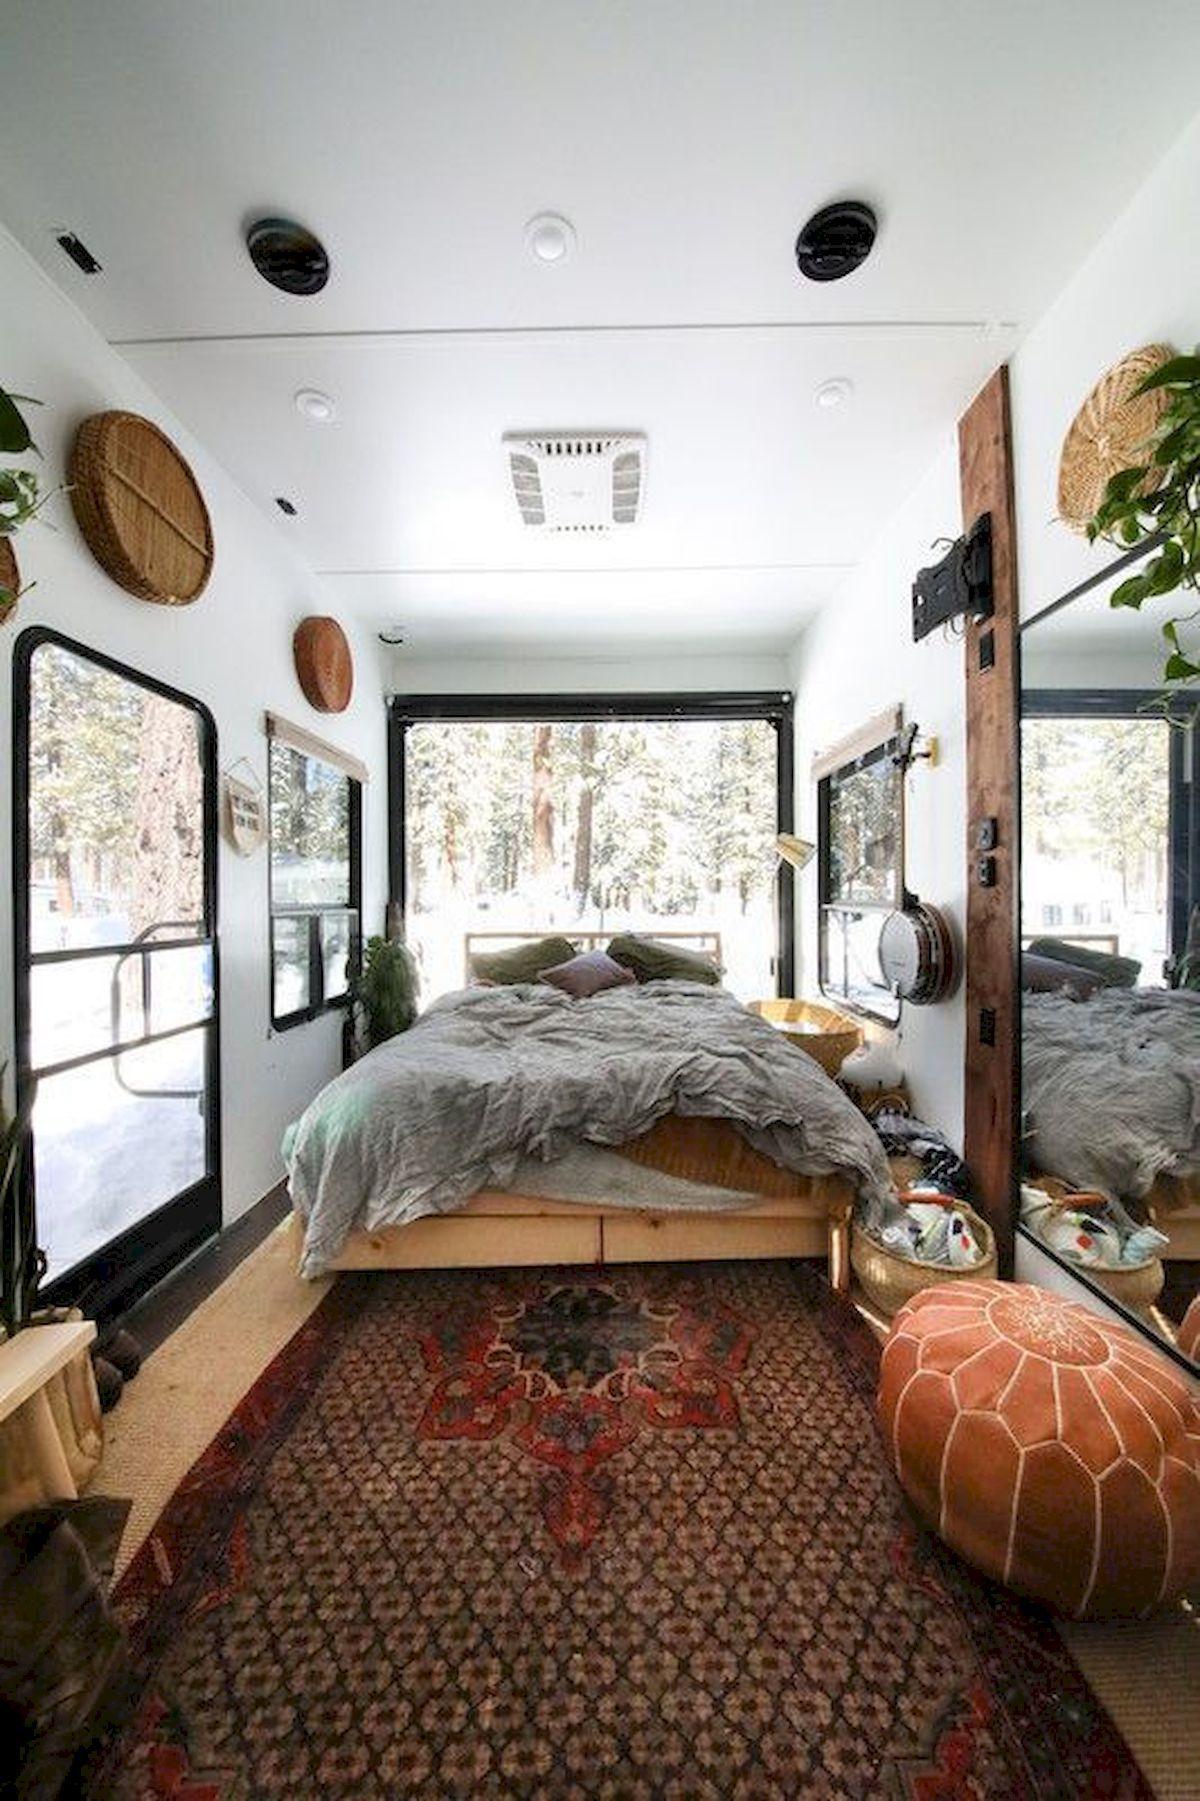 40+ Incerdible Photo Gallery Rustic RV Interior Small